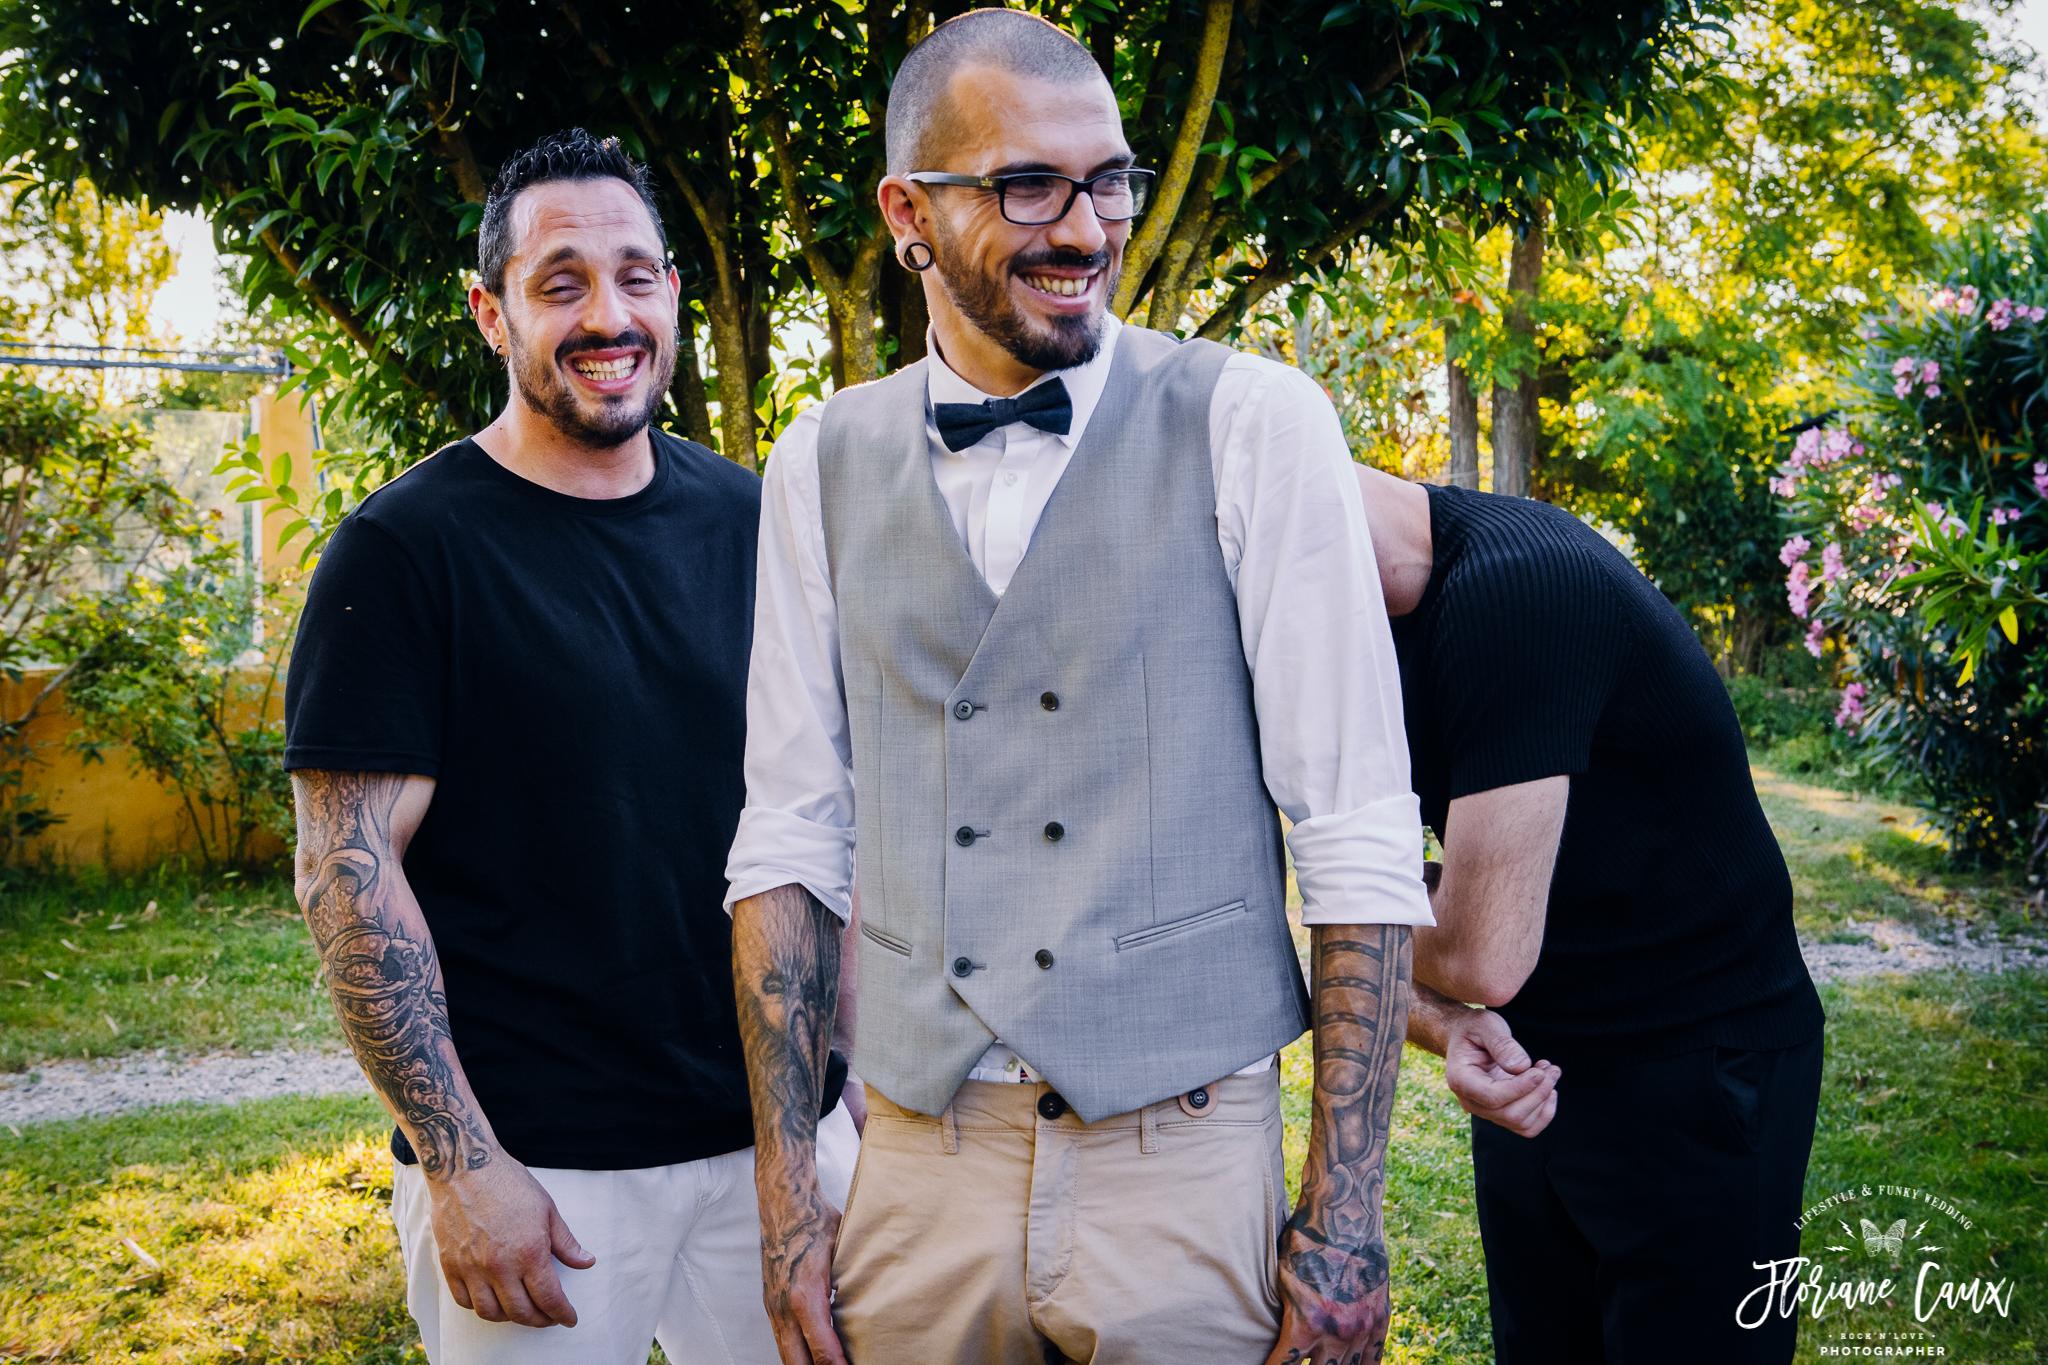 photographe-mariage-toulouse-rocknroll-maries-tatoues-floriane-caux-110